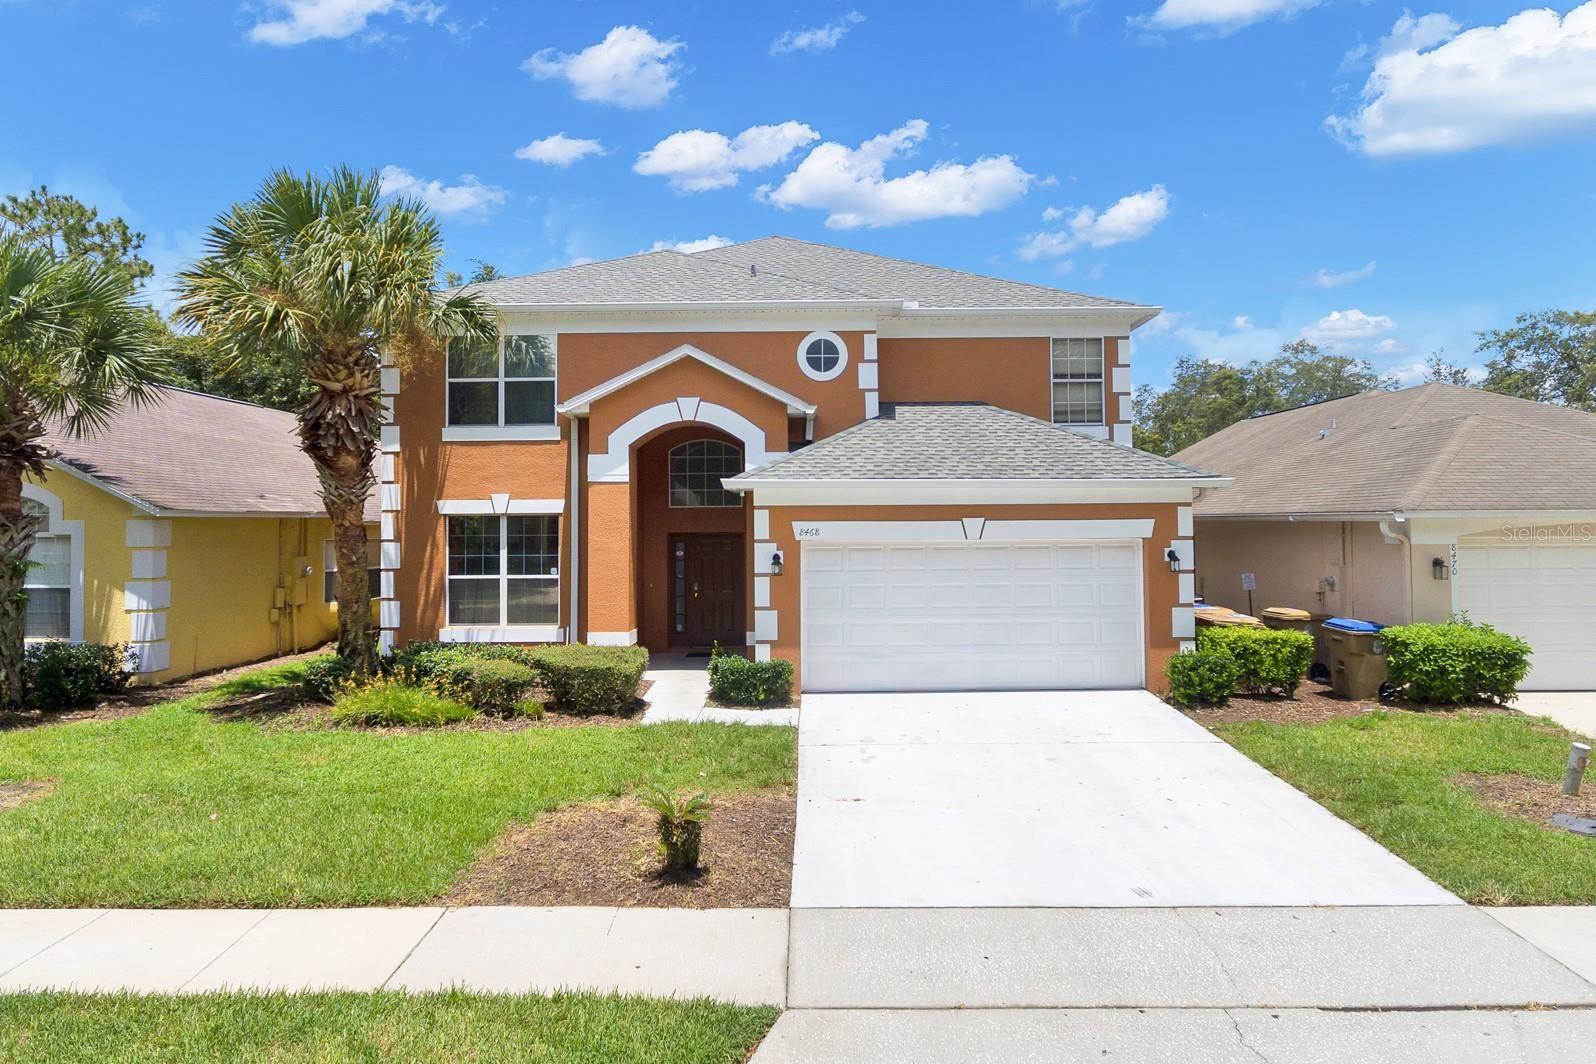 8468 SECRET KEY COVE, Kissimmee, FL 34747 - MLS#: O5958475